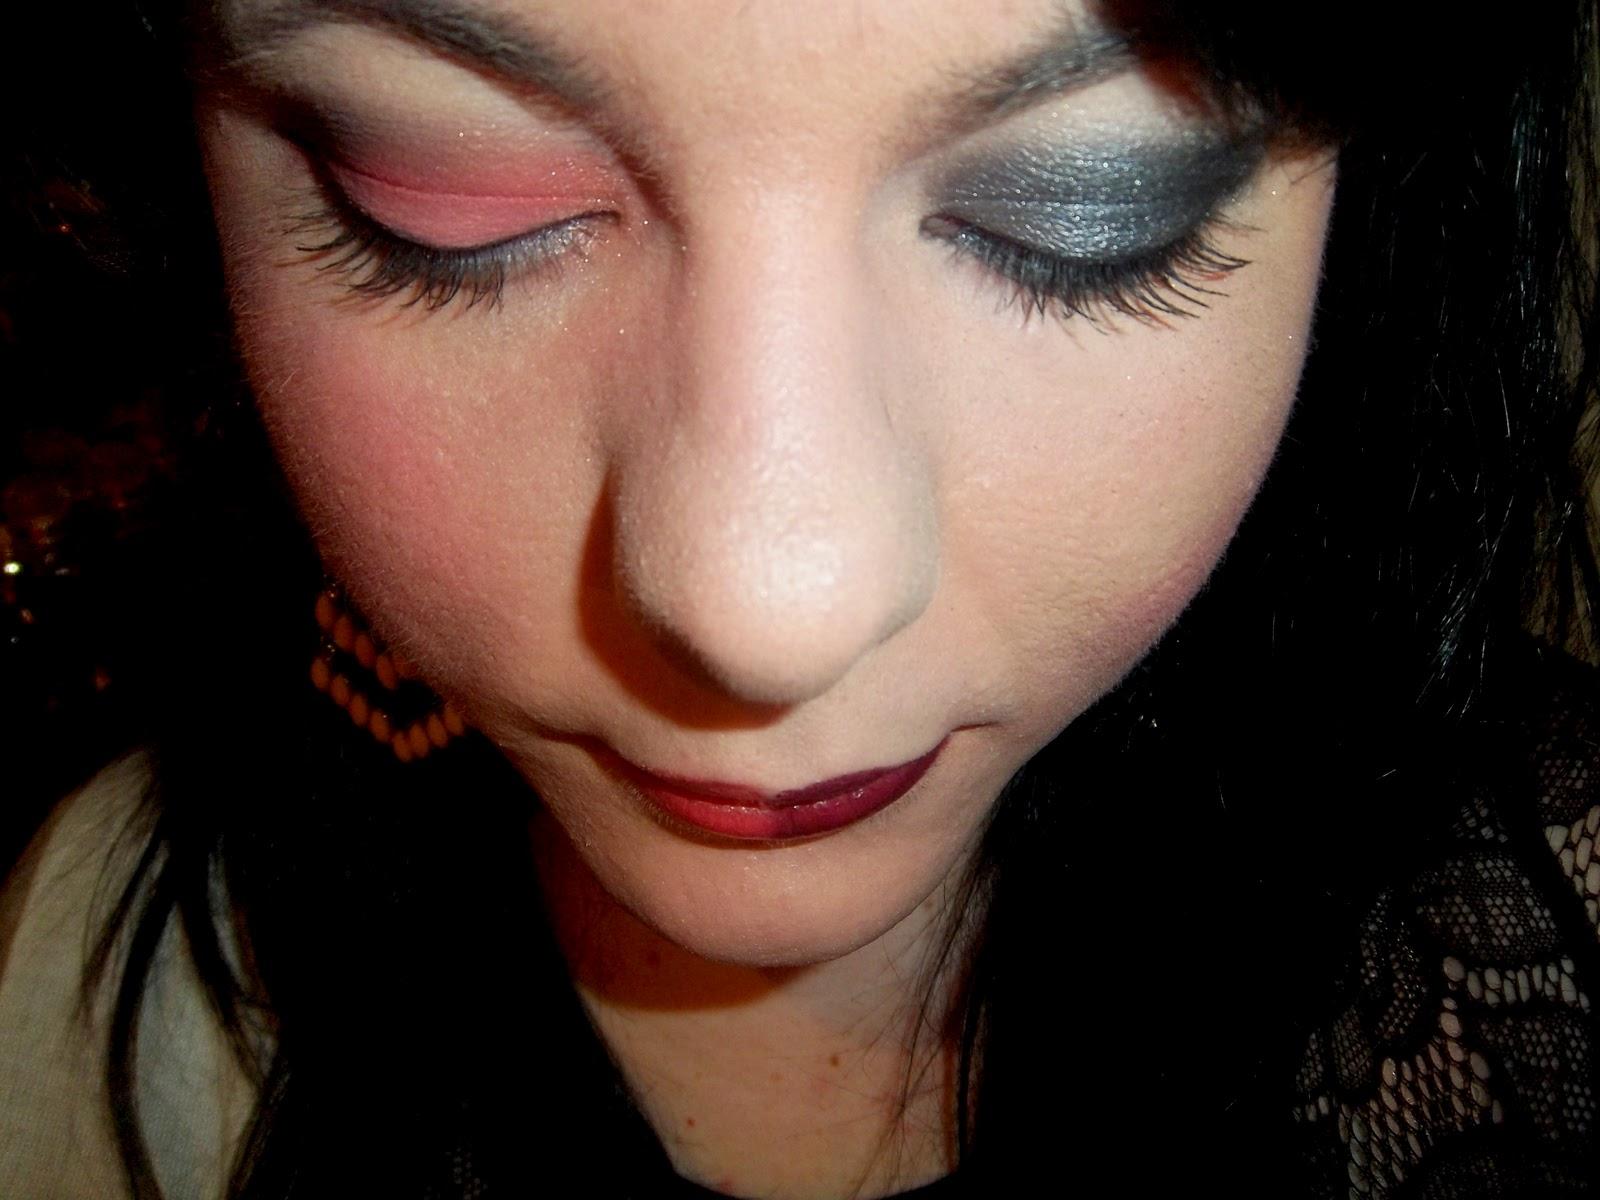 TUTORIAL - Bad Girl u0026 Good Girl Makeup